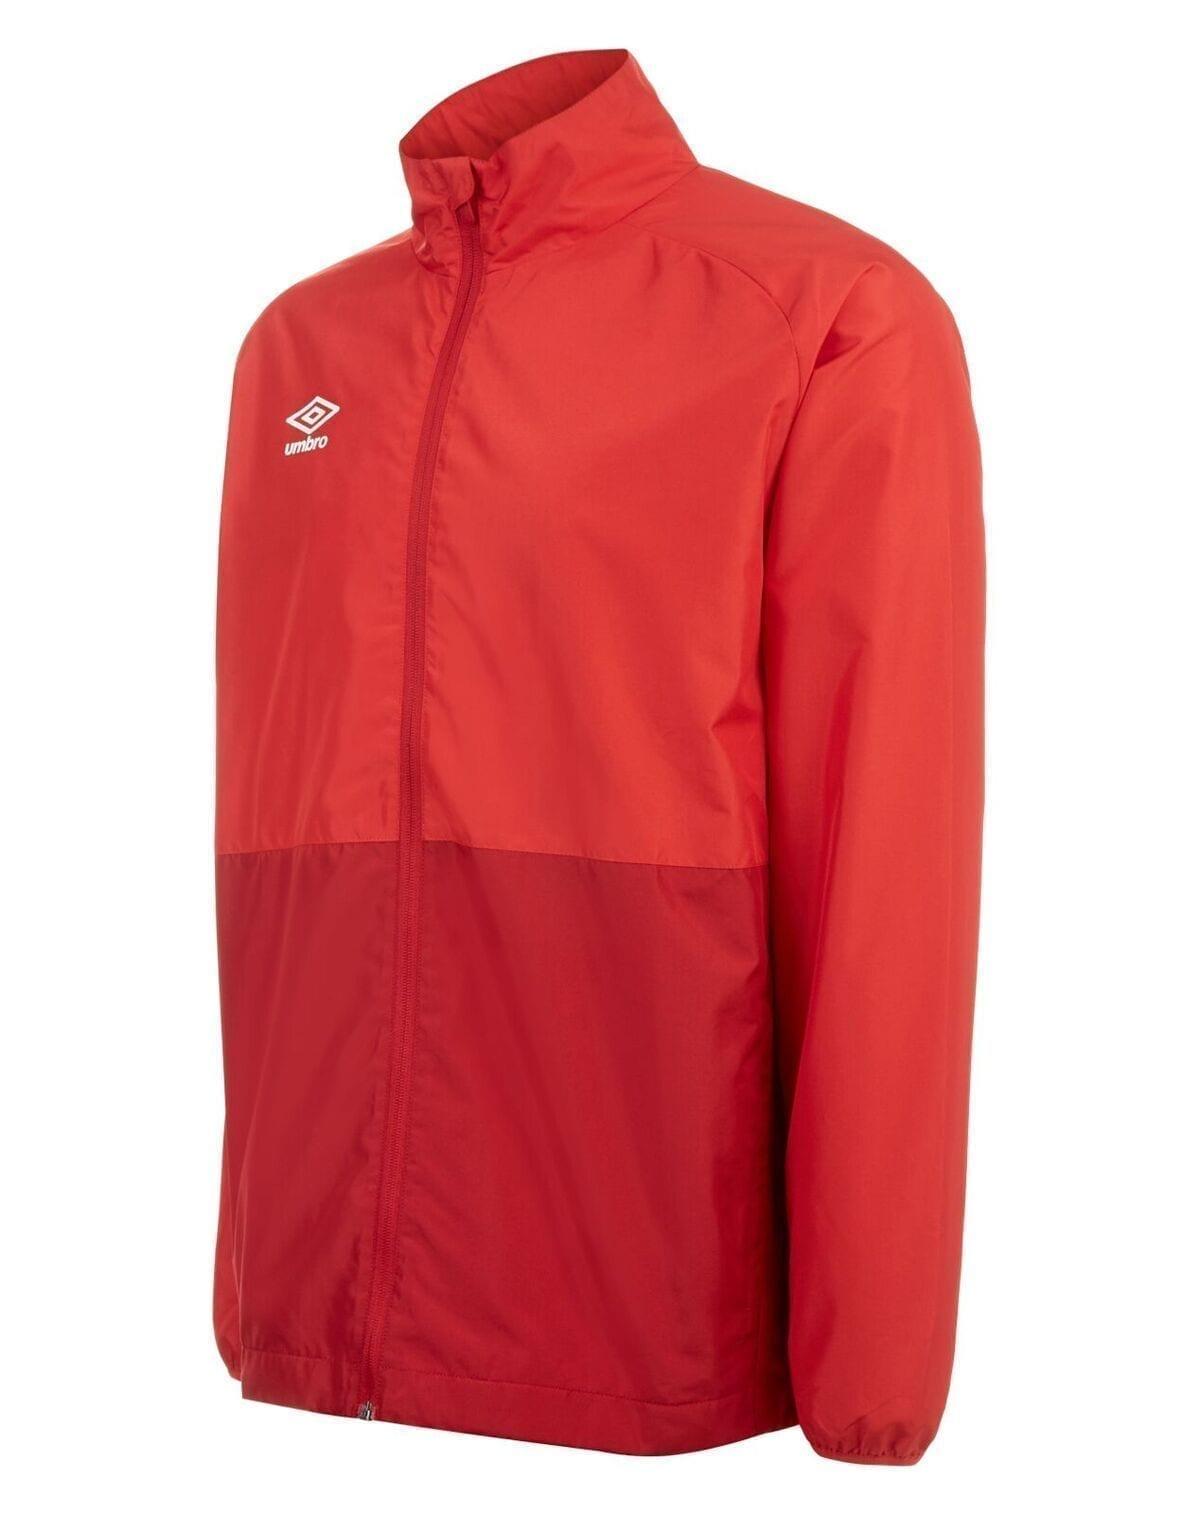 shower jacket red 30472 p